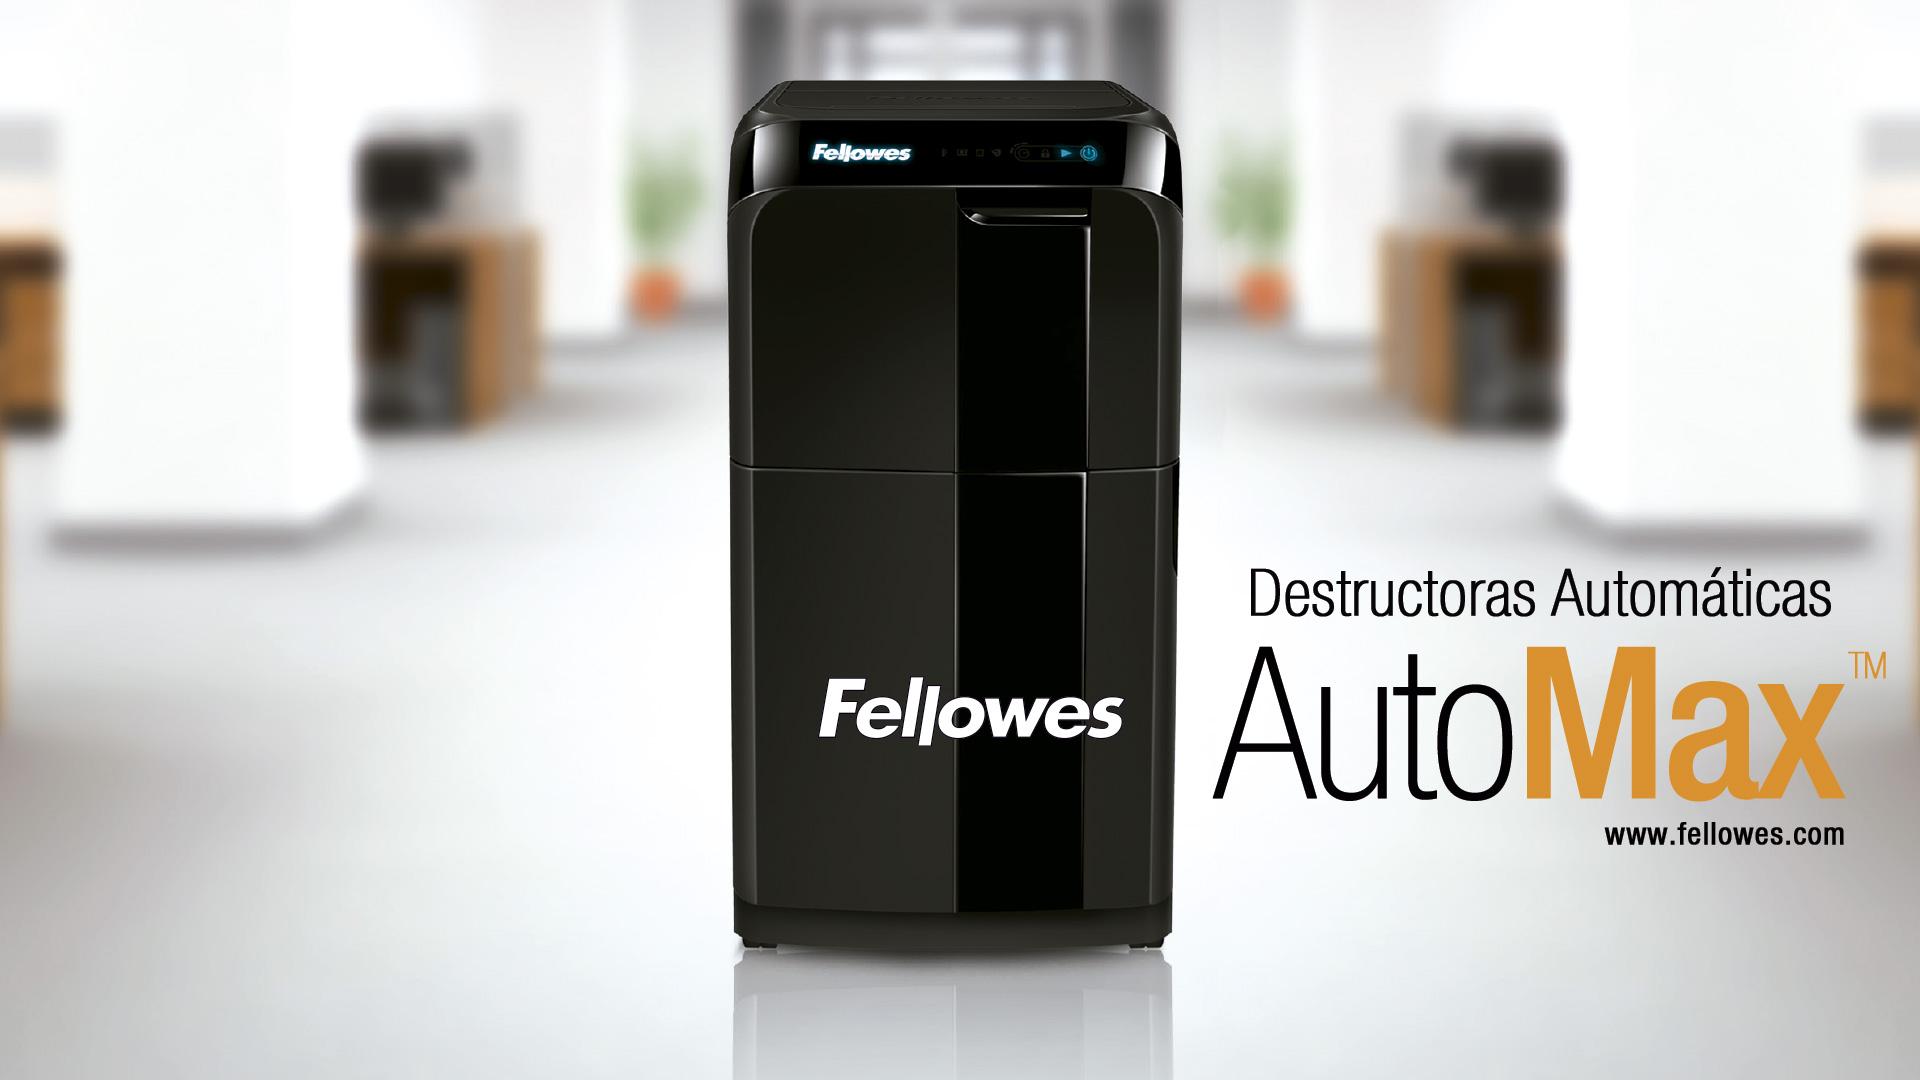 Destructoras automáticas AutoMax